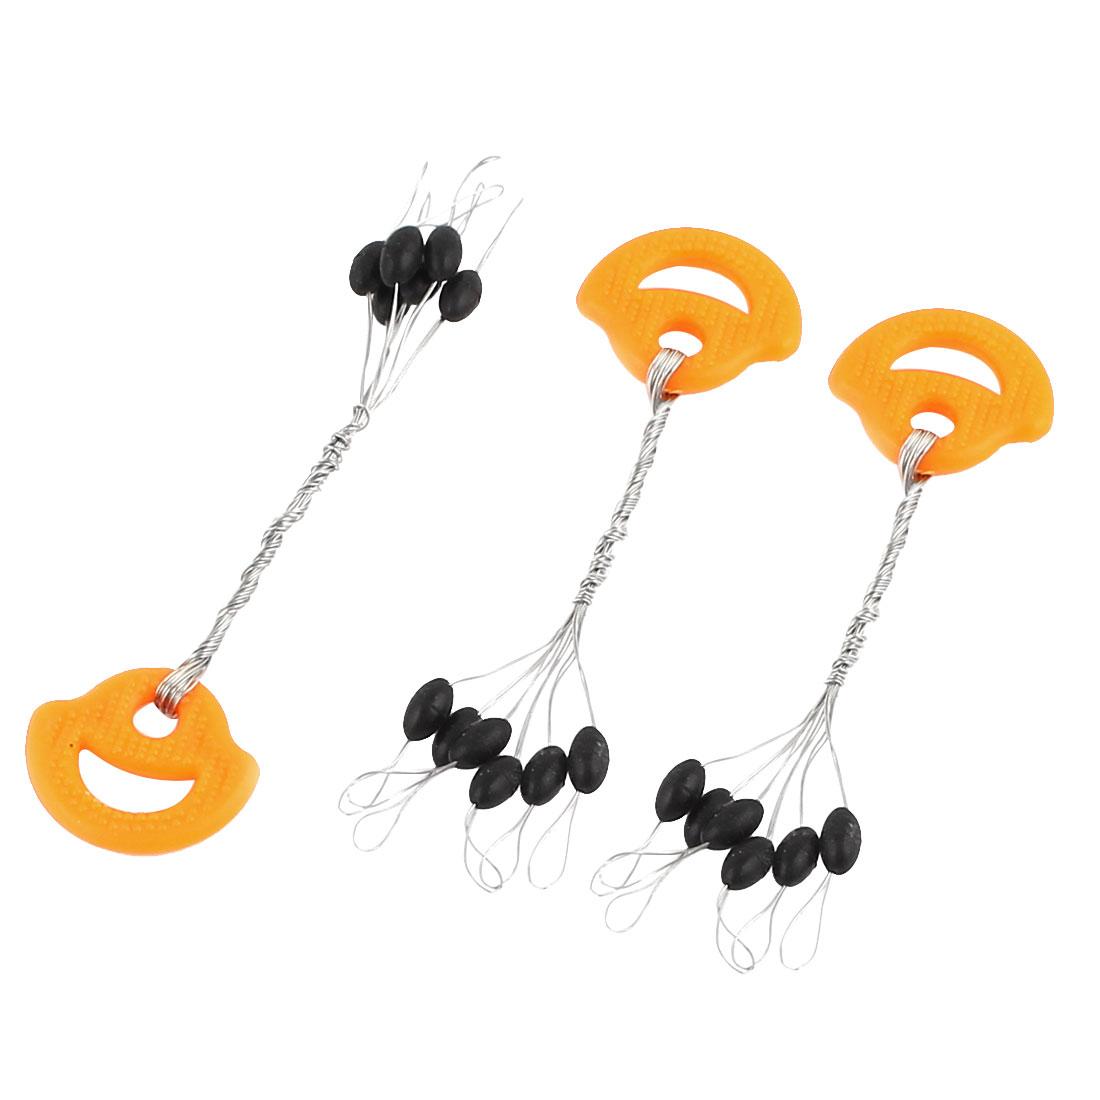 Unique Bargains 3 Pieces 6 in 1 Oval Design Stop Bead Black Fishing Bobber Stopper Size M